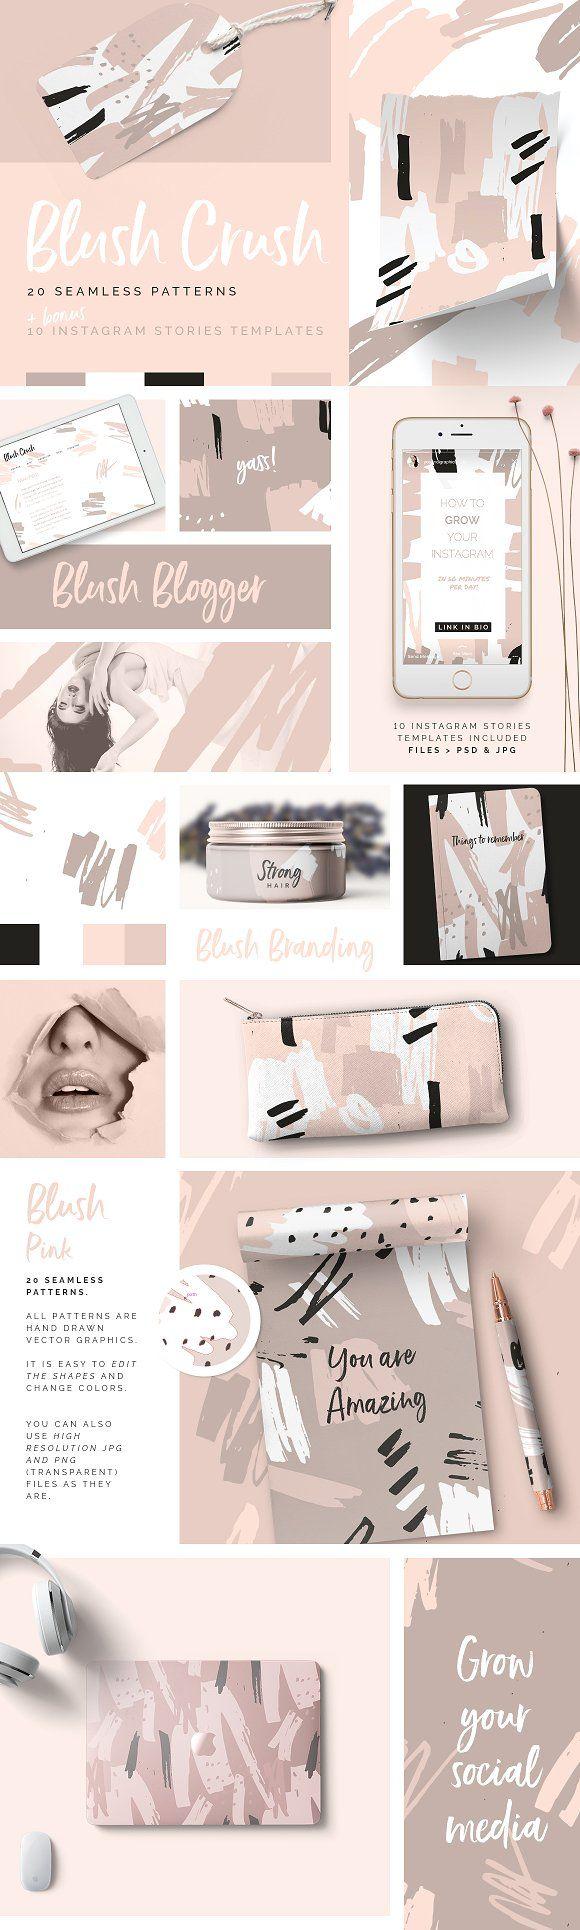 Blush Crush Patterns & Templates by Youandigraphics on @creativemarket